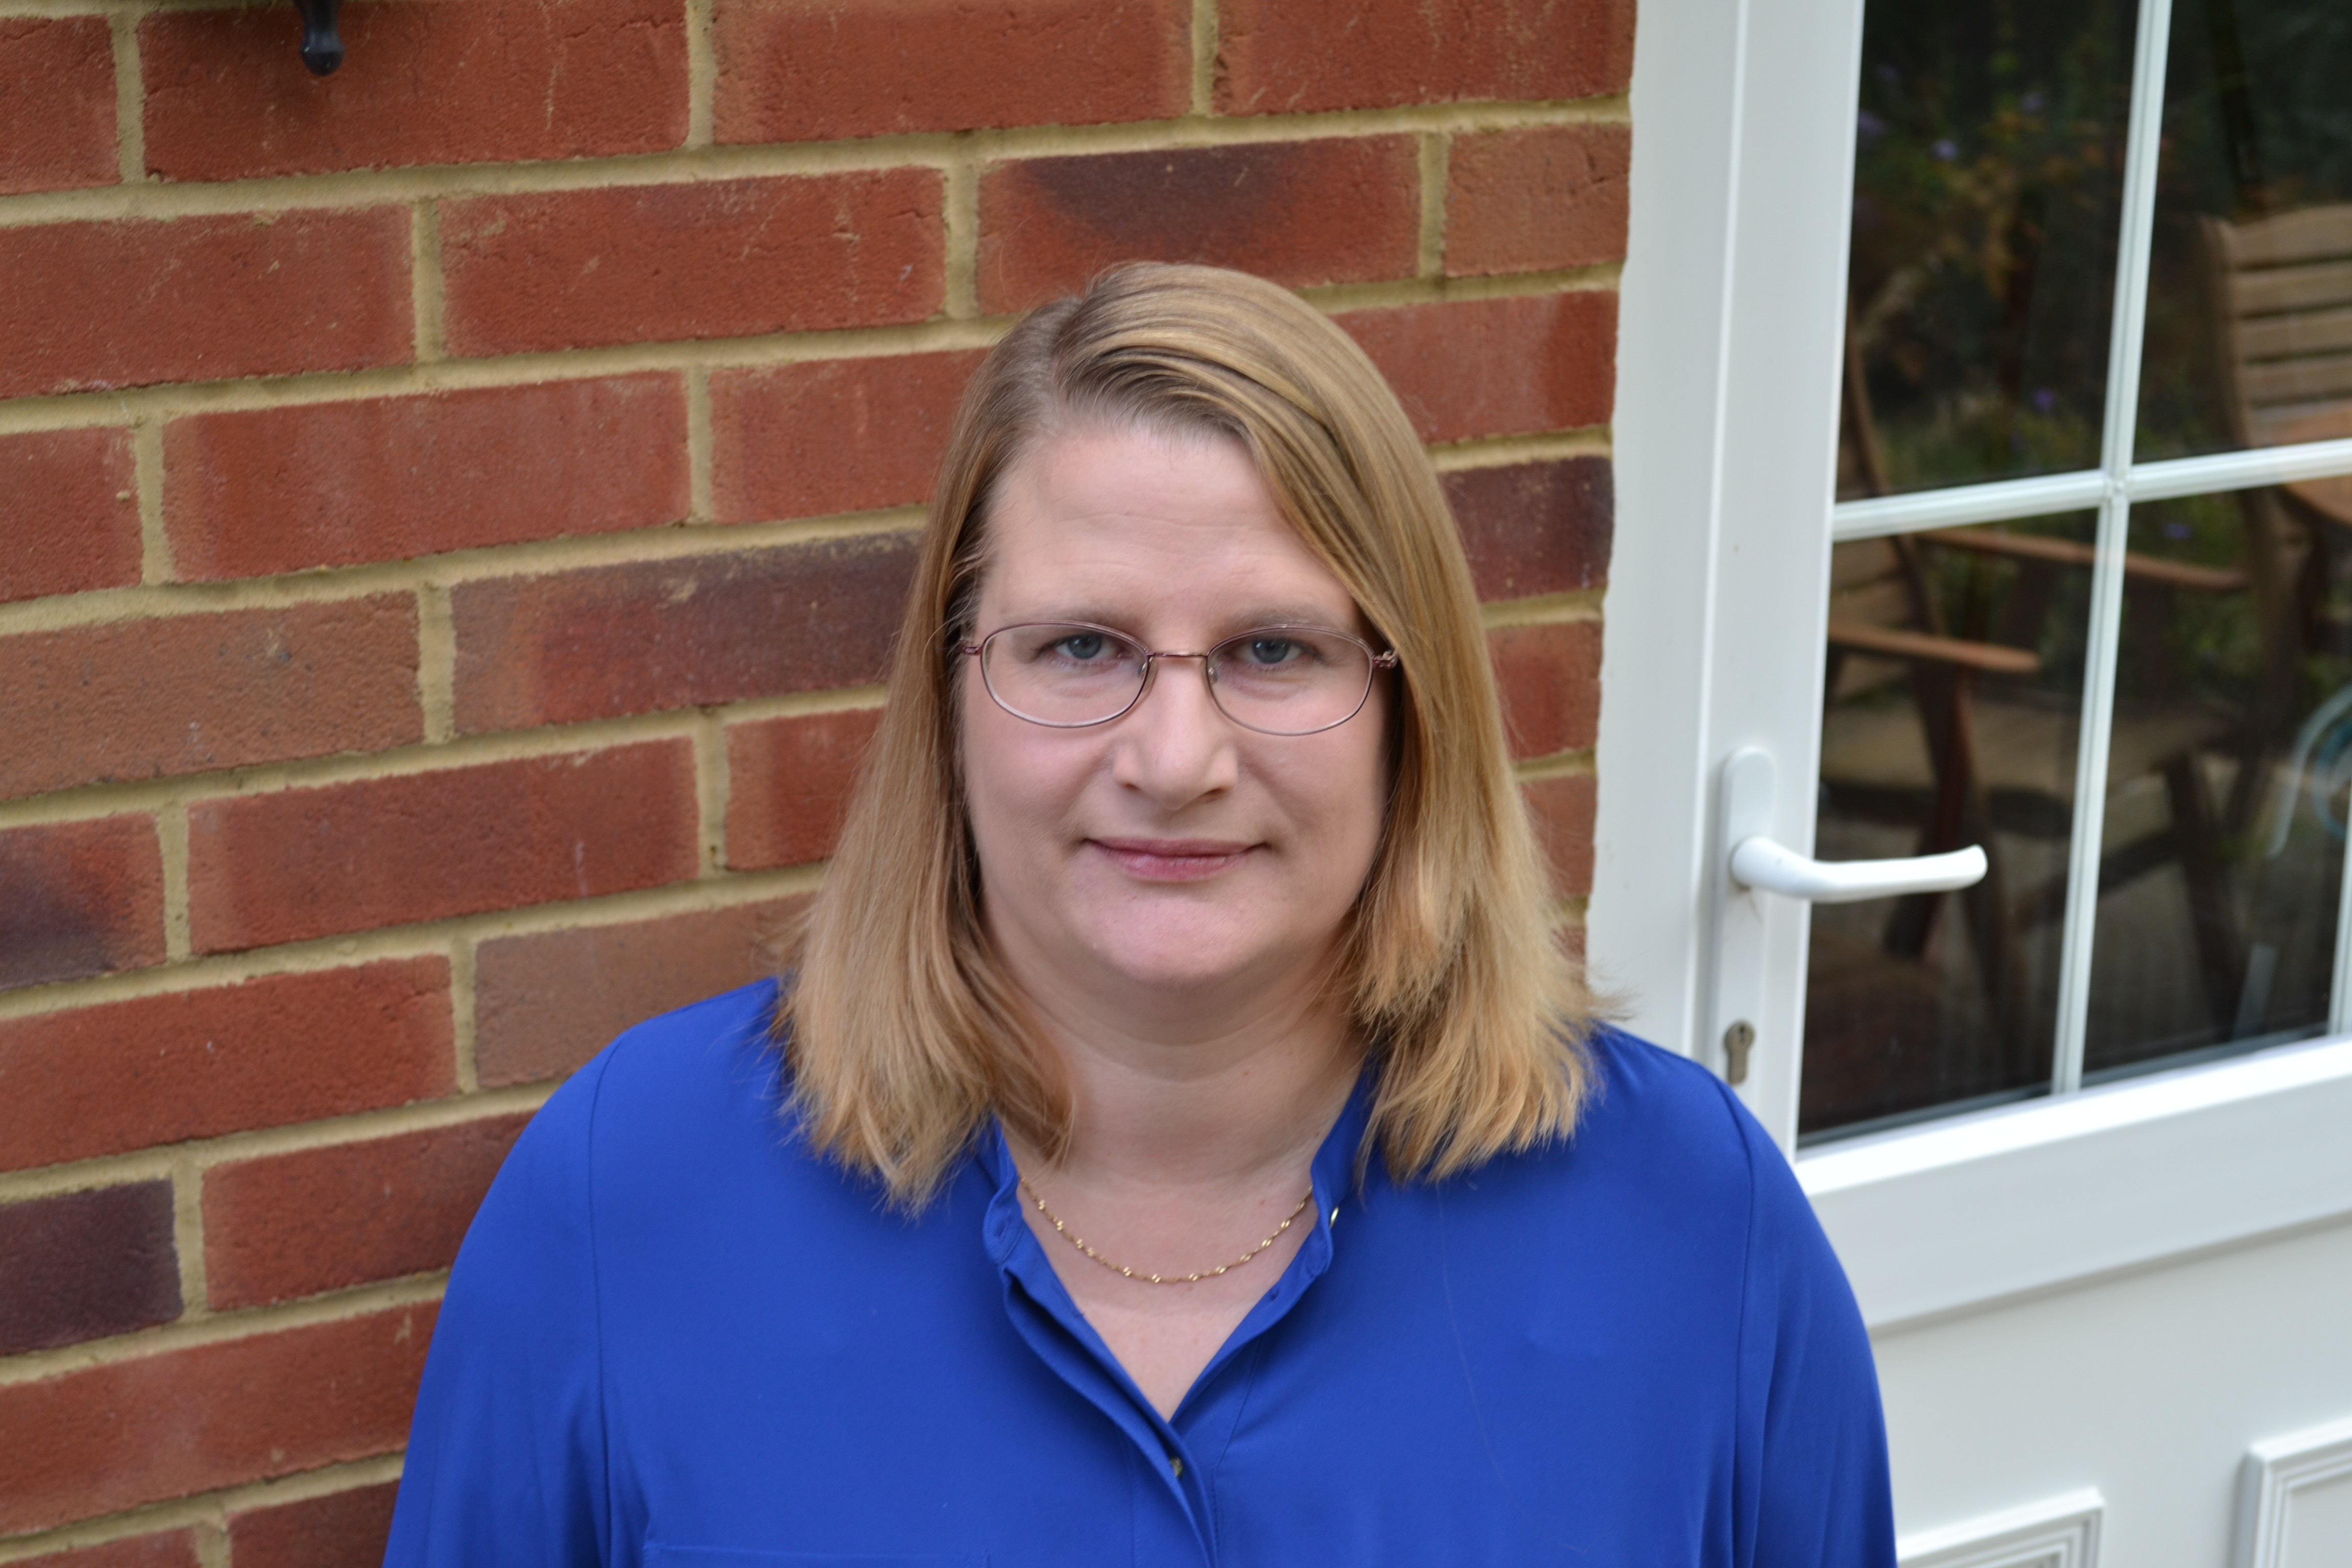 Dr. Kate Tutor